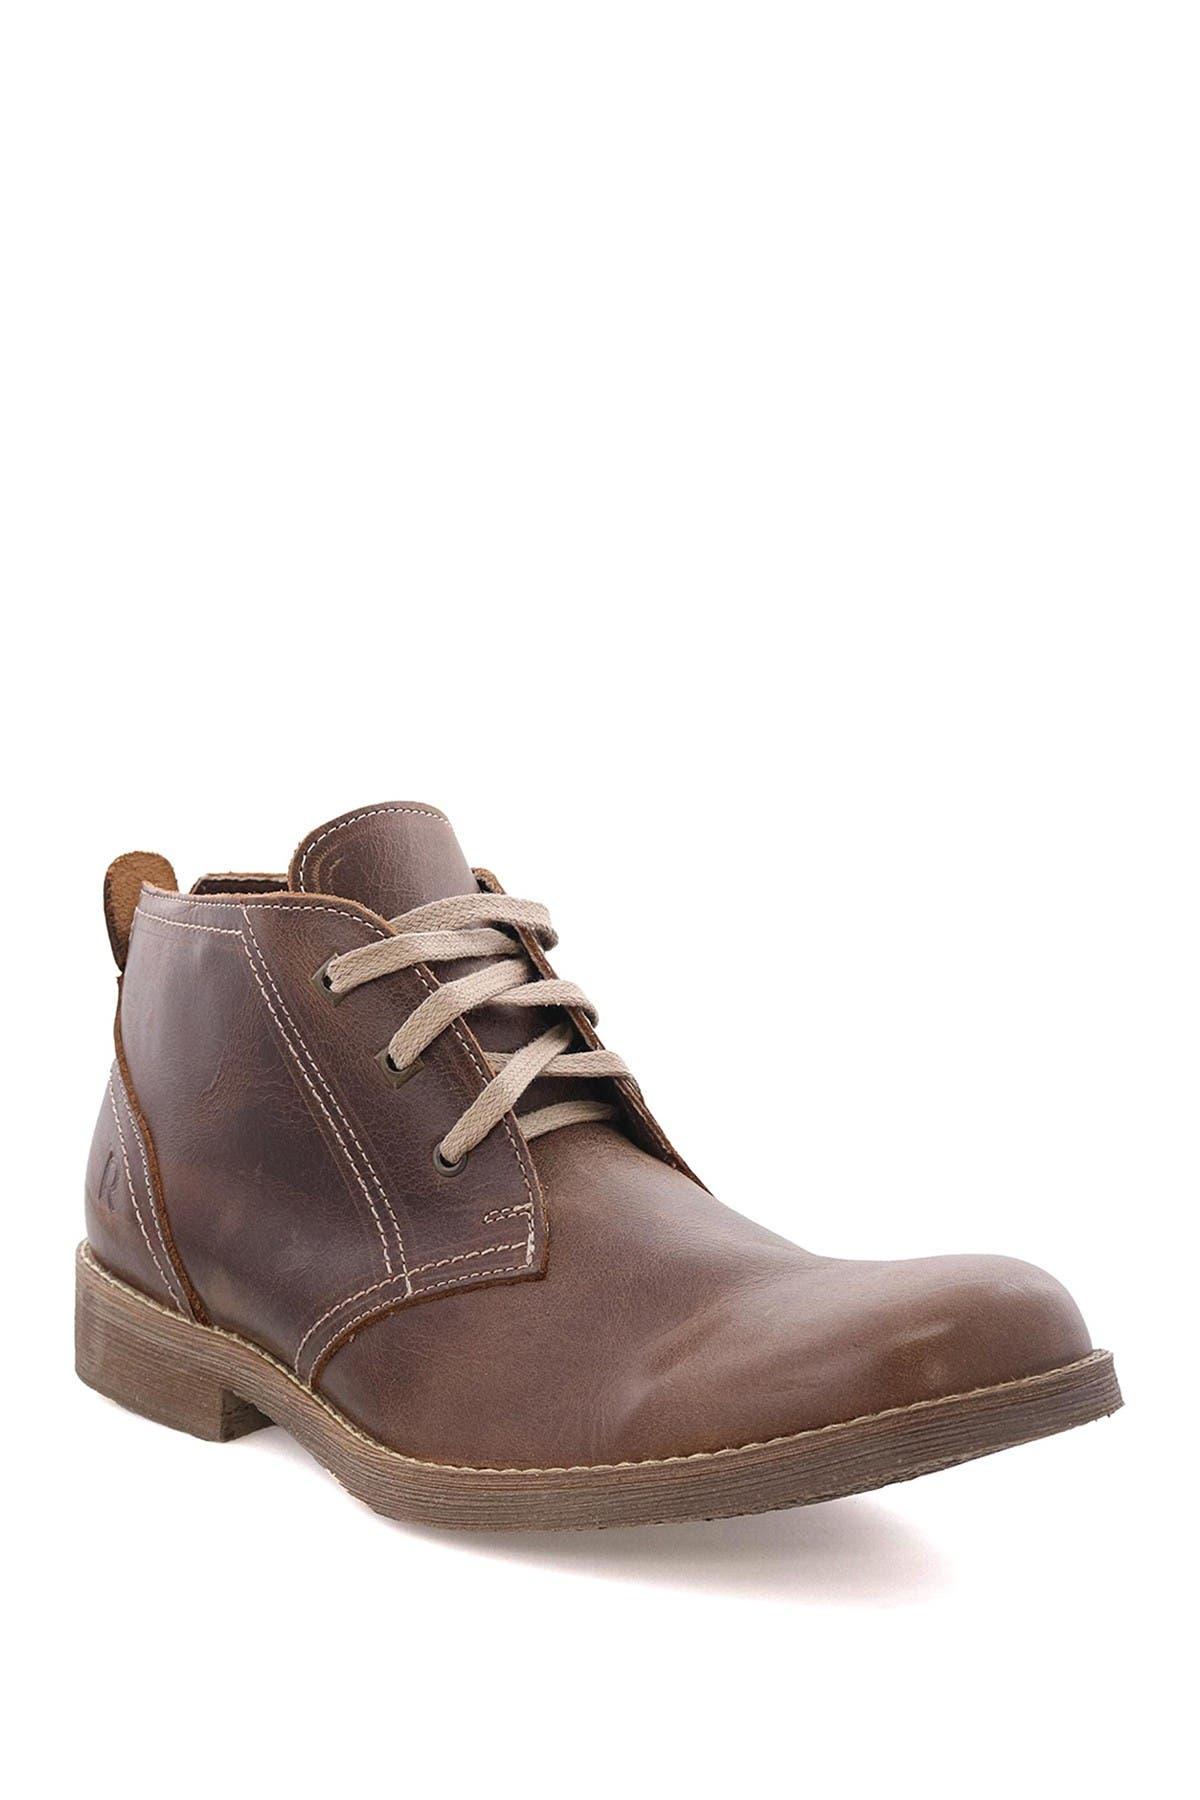 Image of Roan Gaven Leather Chukka Boot